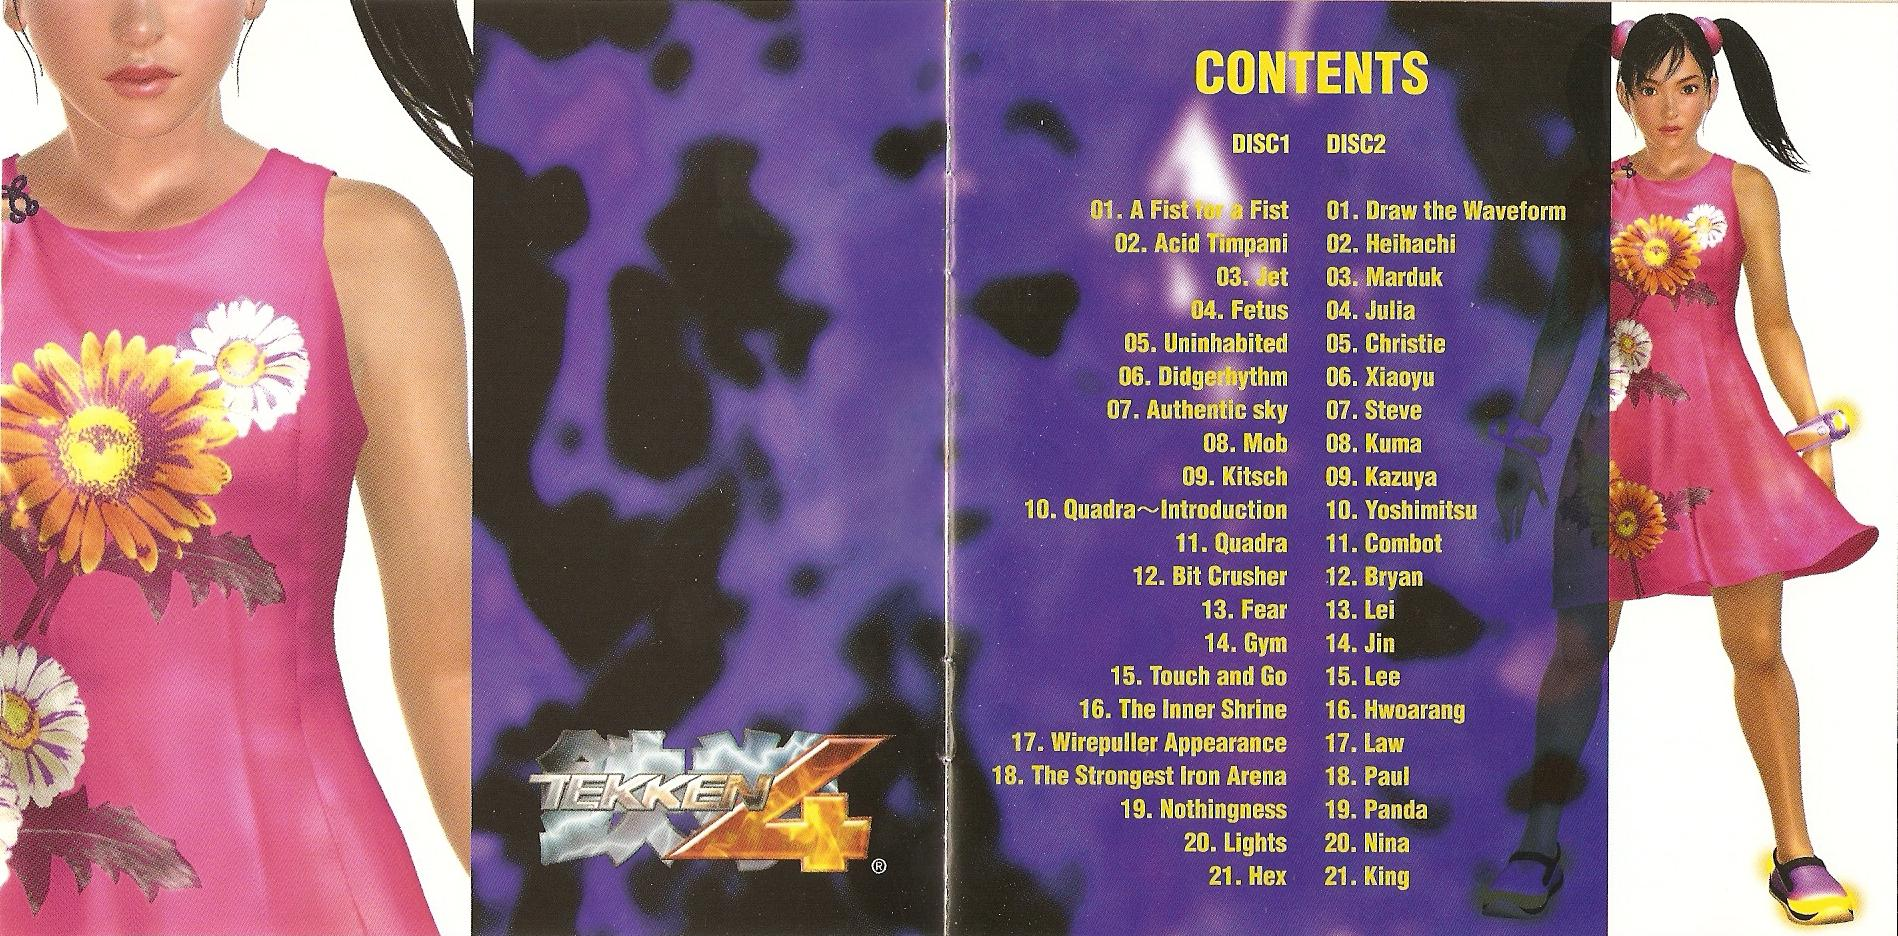 Tekken 4 Original Sound Tracks Mp3 Download Tekken 4 Original